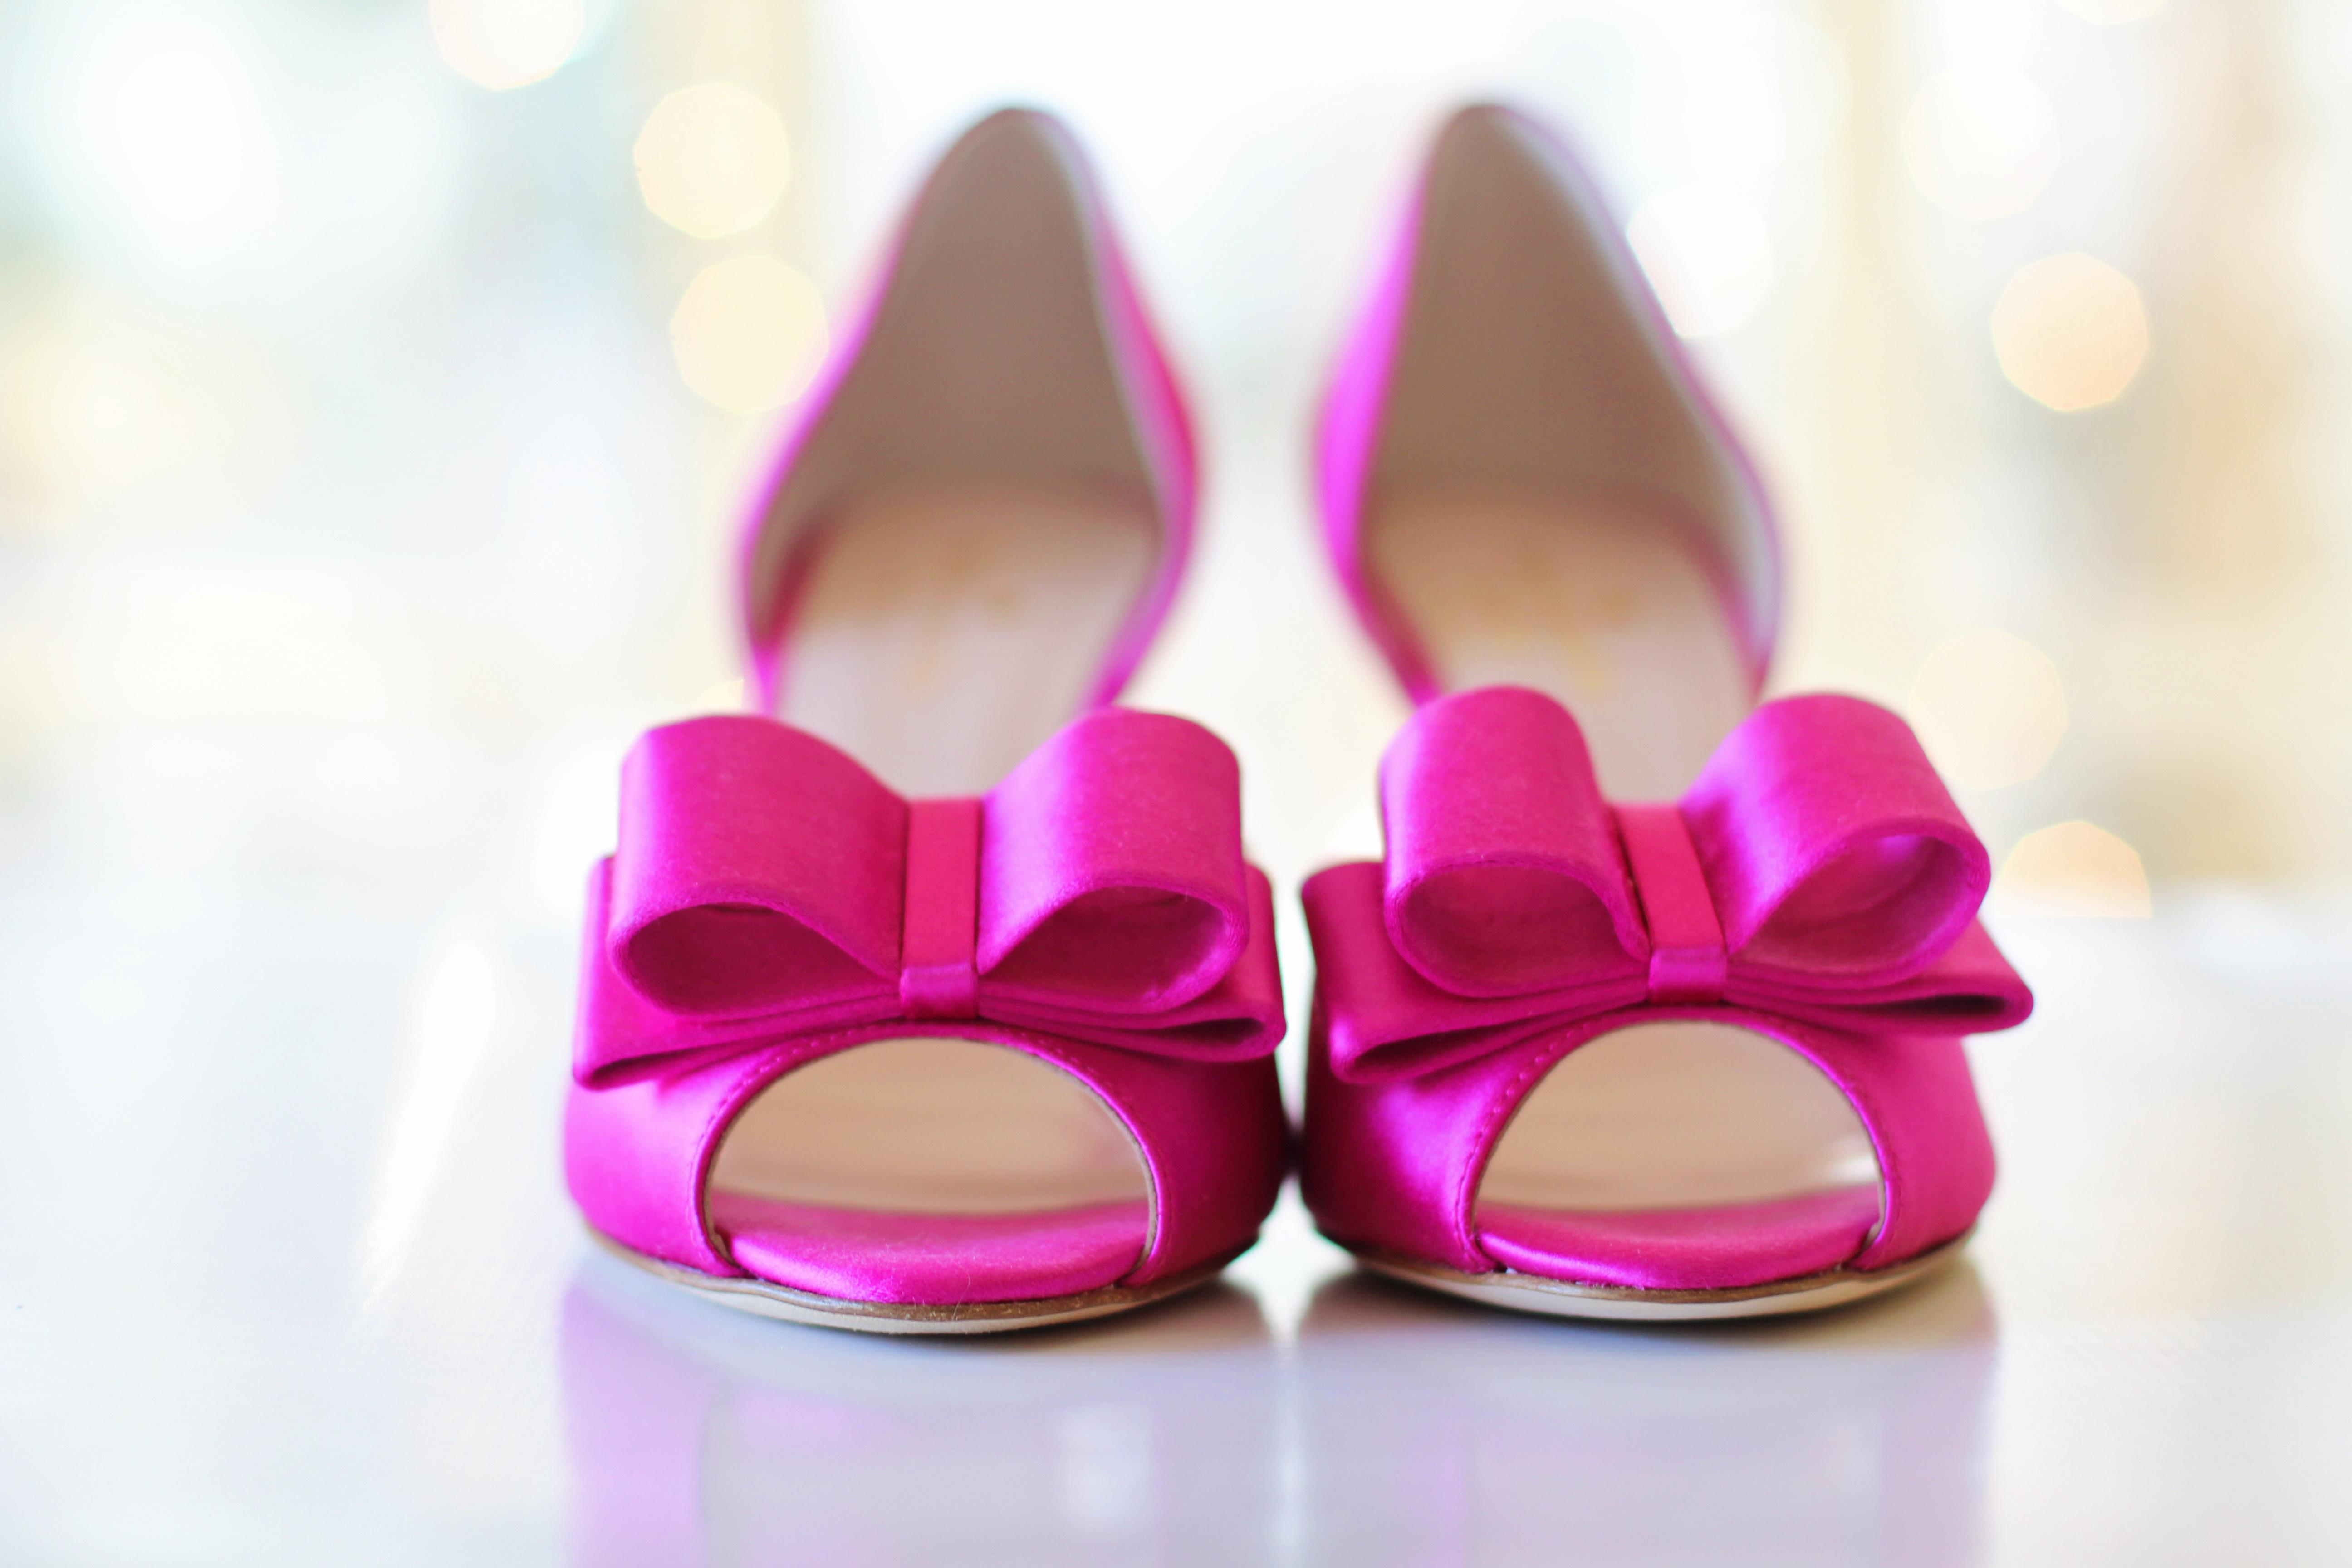 images of wedding shoes photo - 1